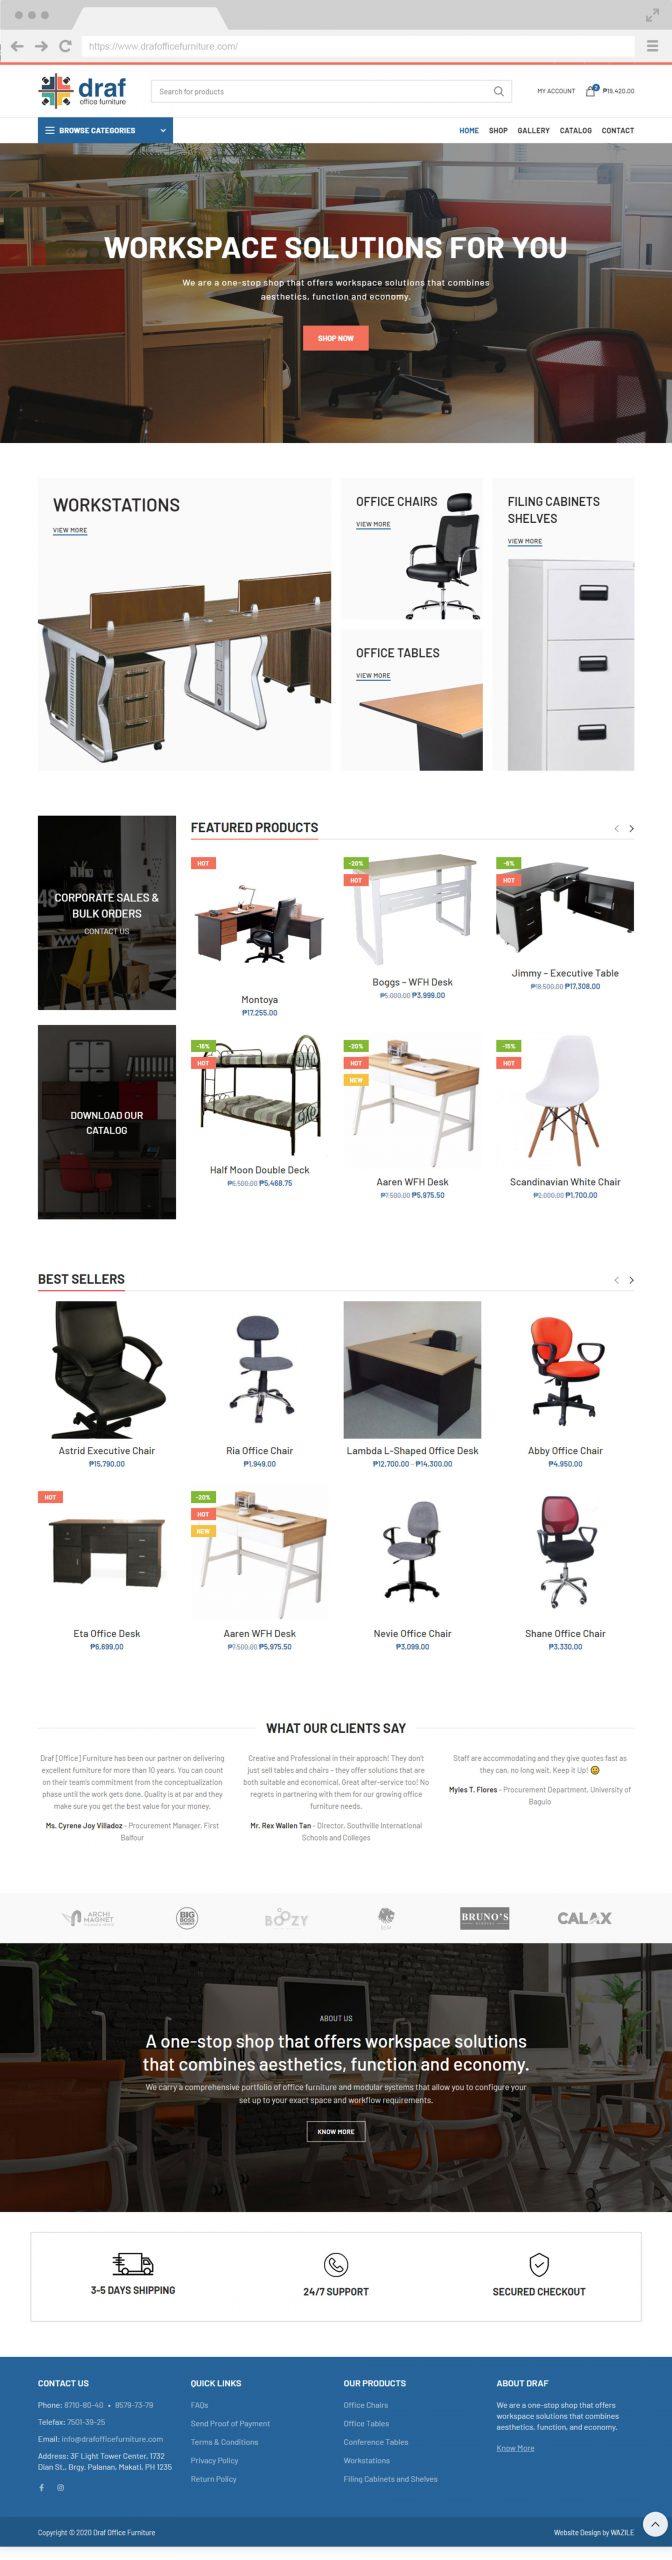 Draf Office Furniture Homepage